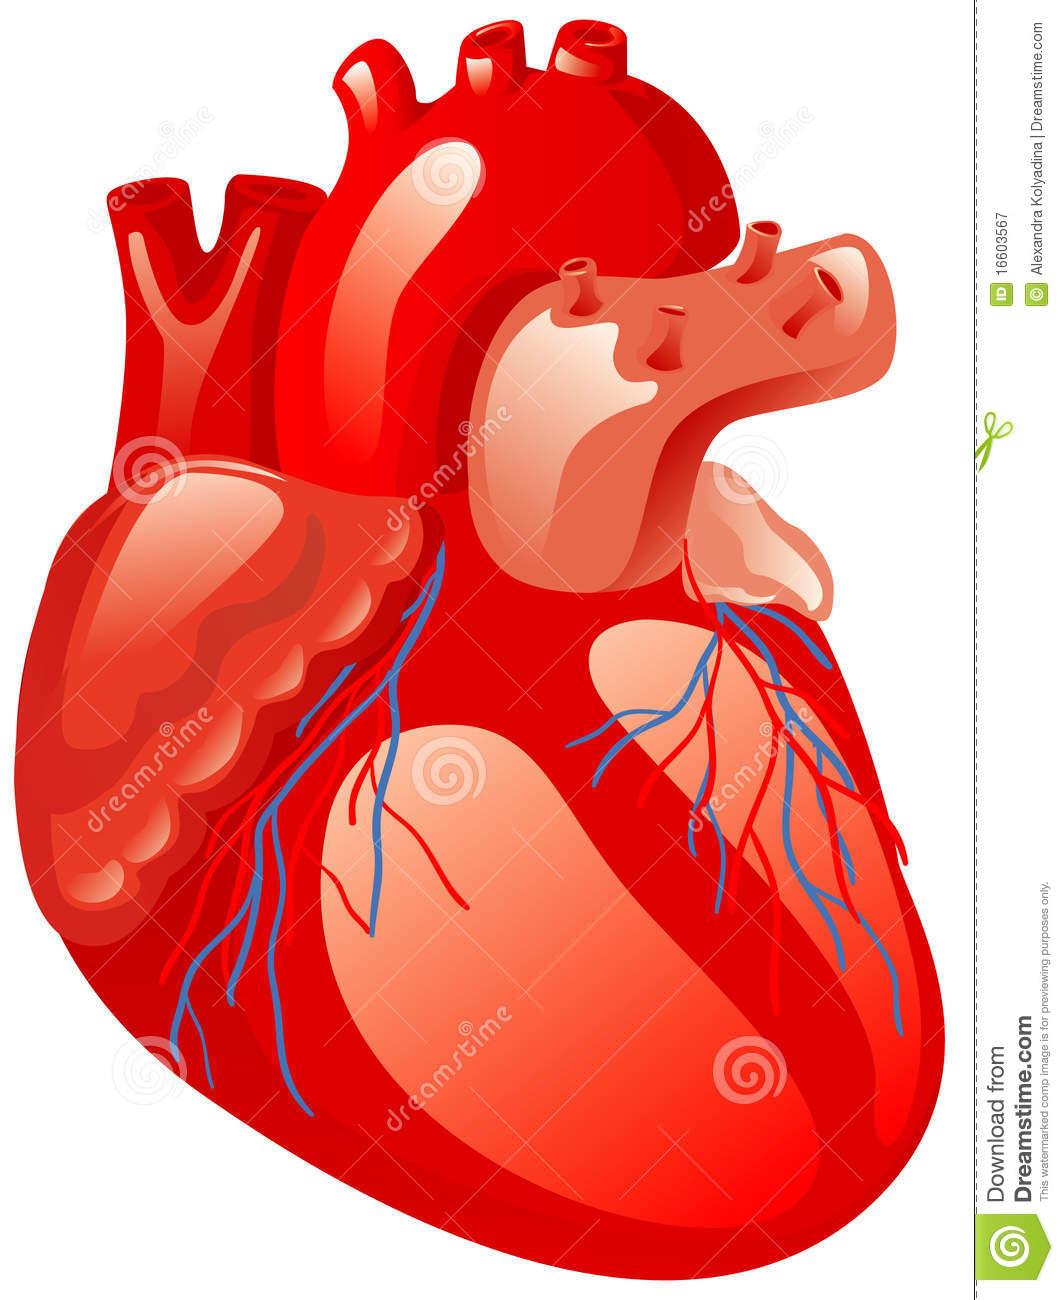 Human Heart Royalty Free Stock Photography Image 16603567